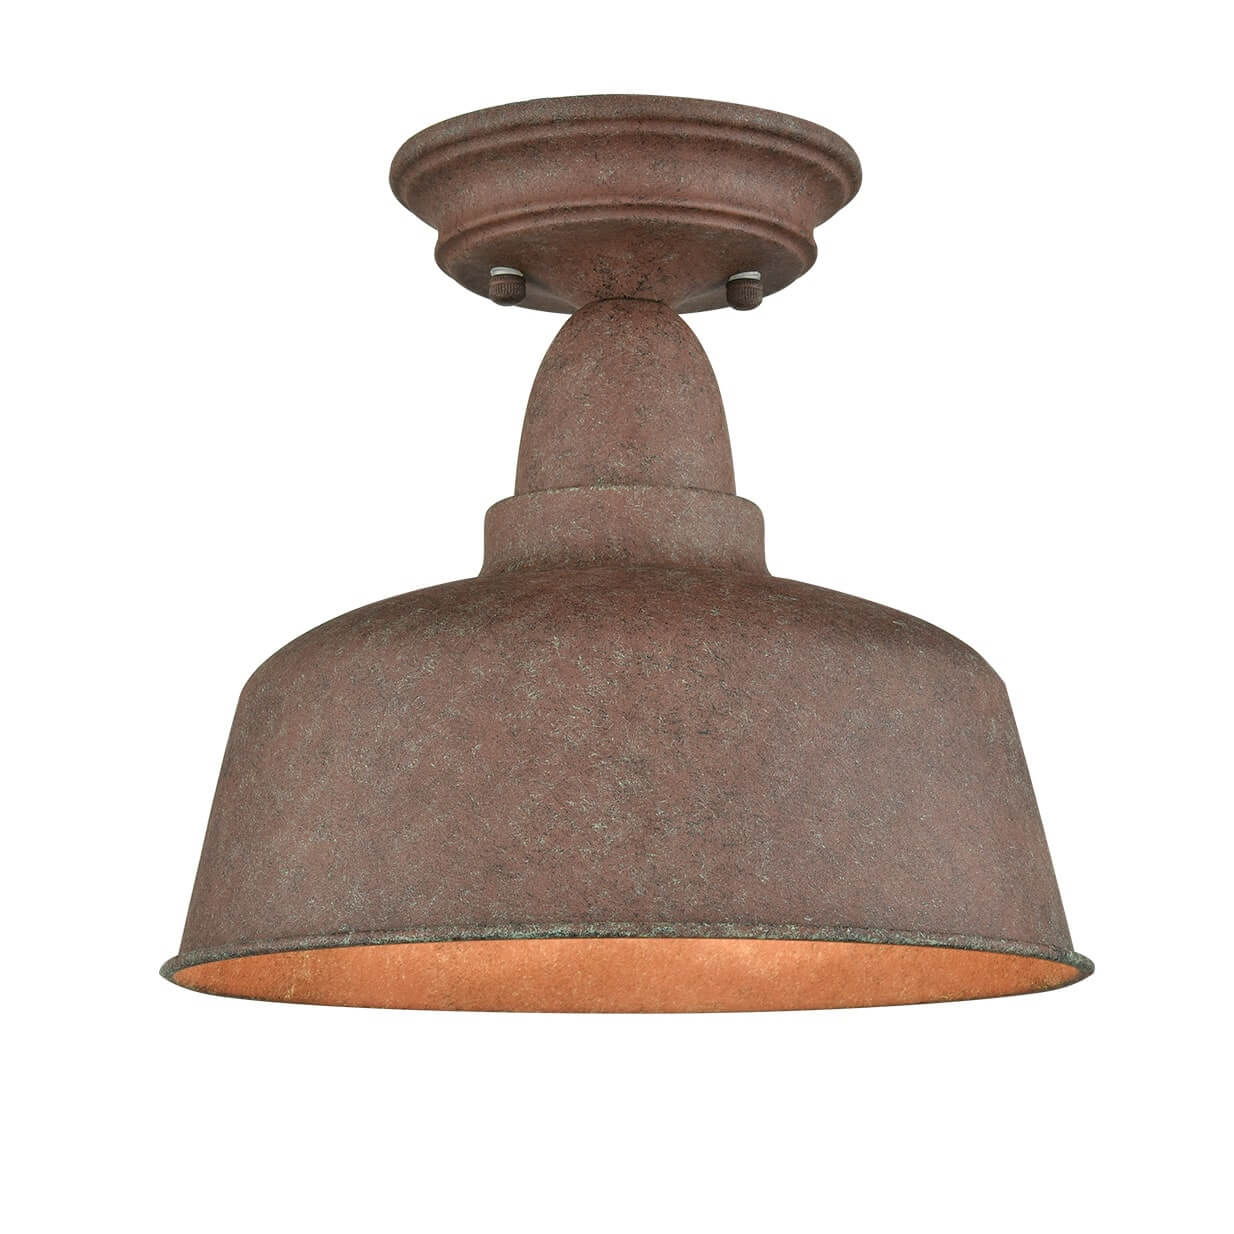 Rustic Metal Barn Ceiling Light Retro Semi Flush Mount Ceiling Lighting